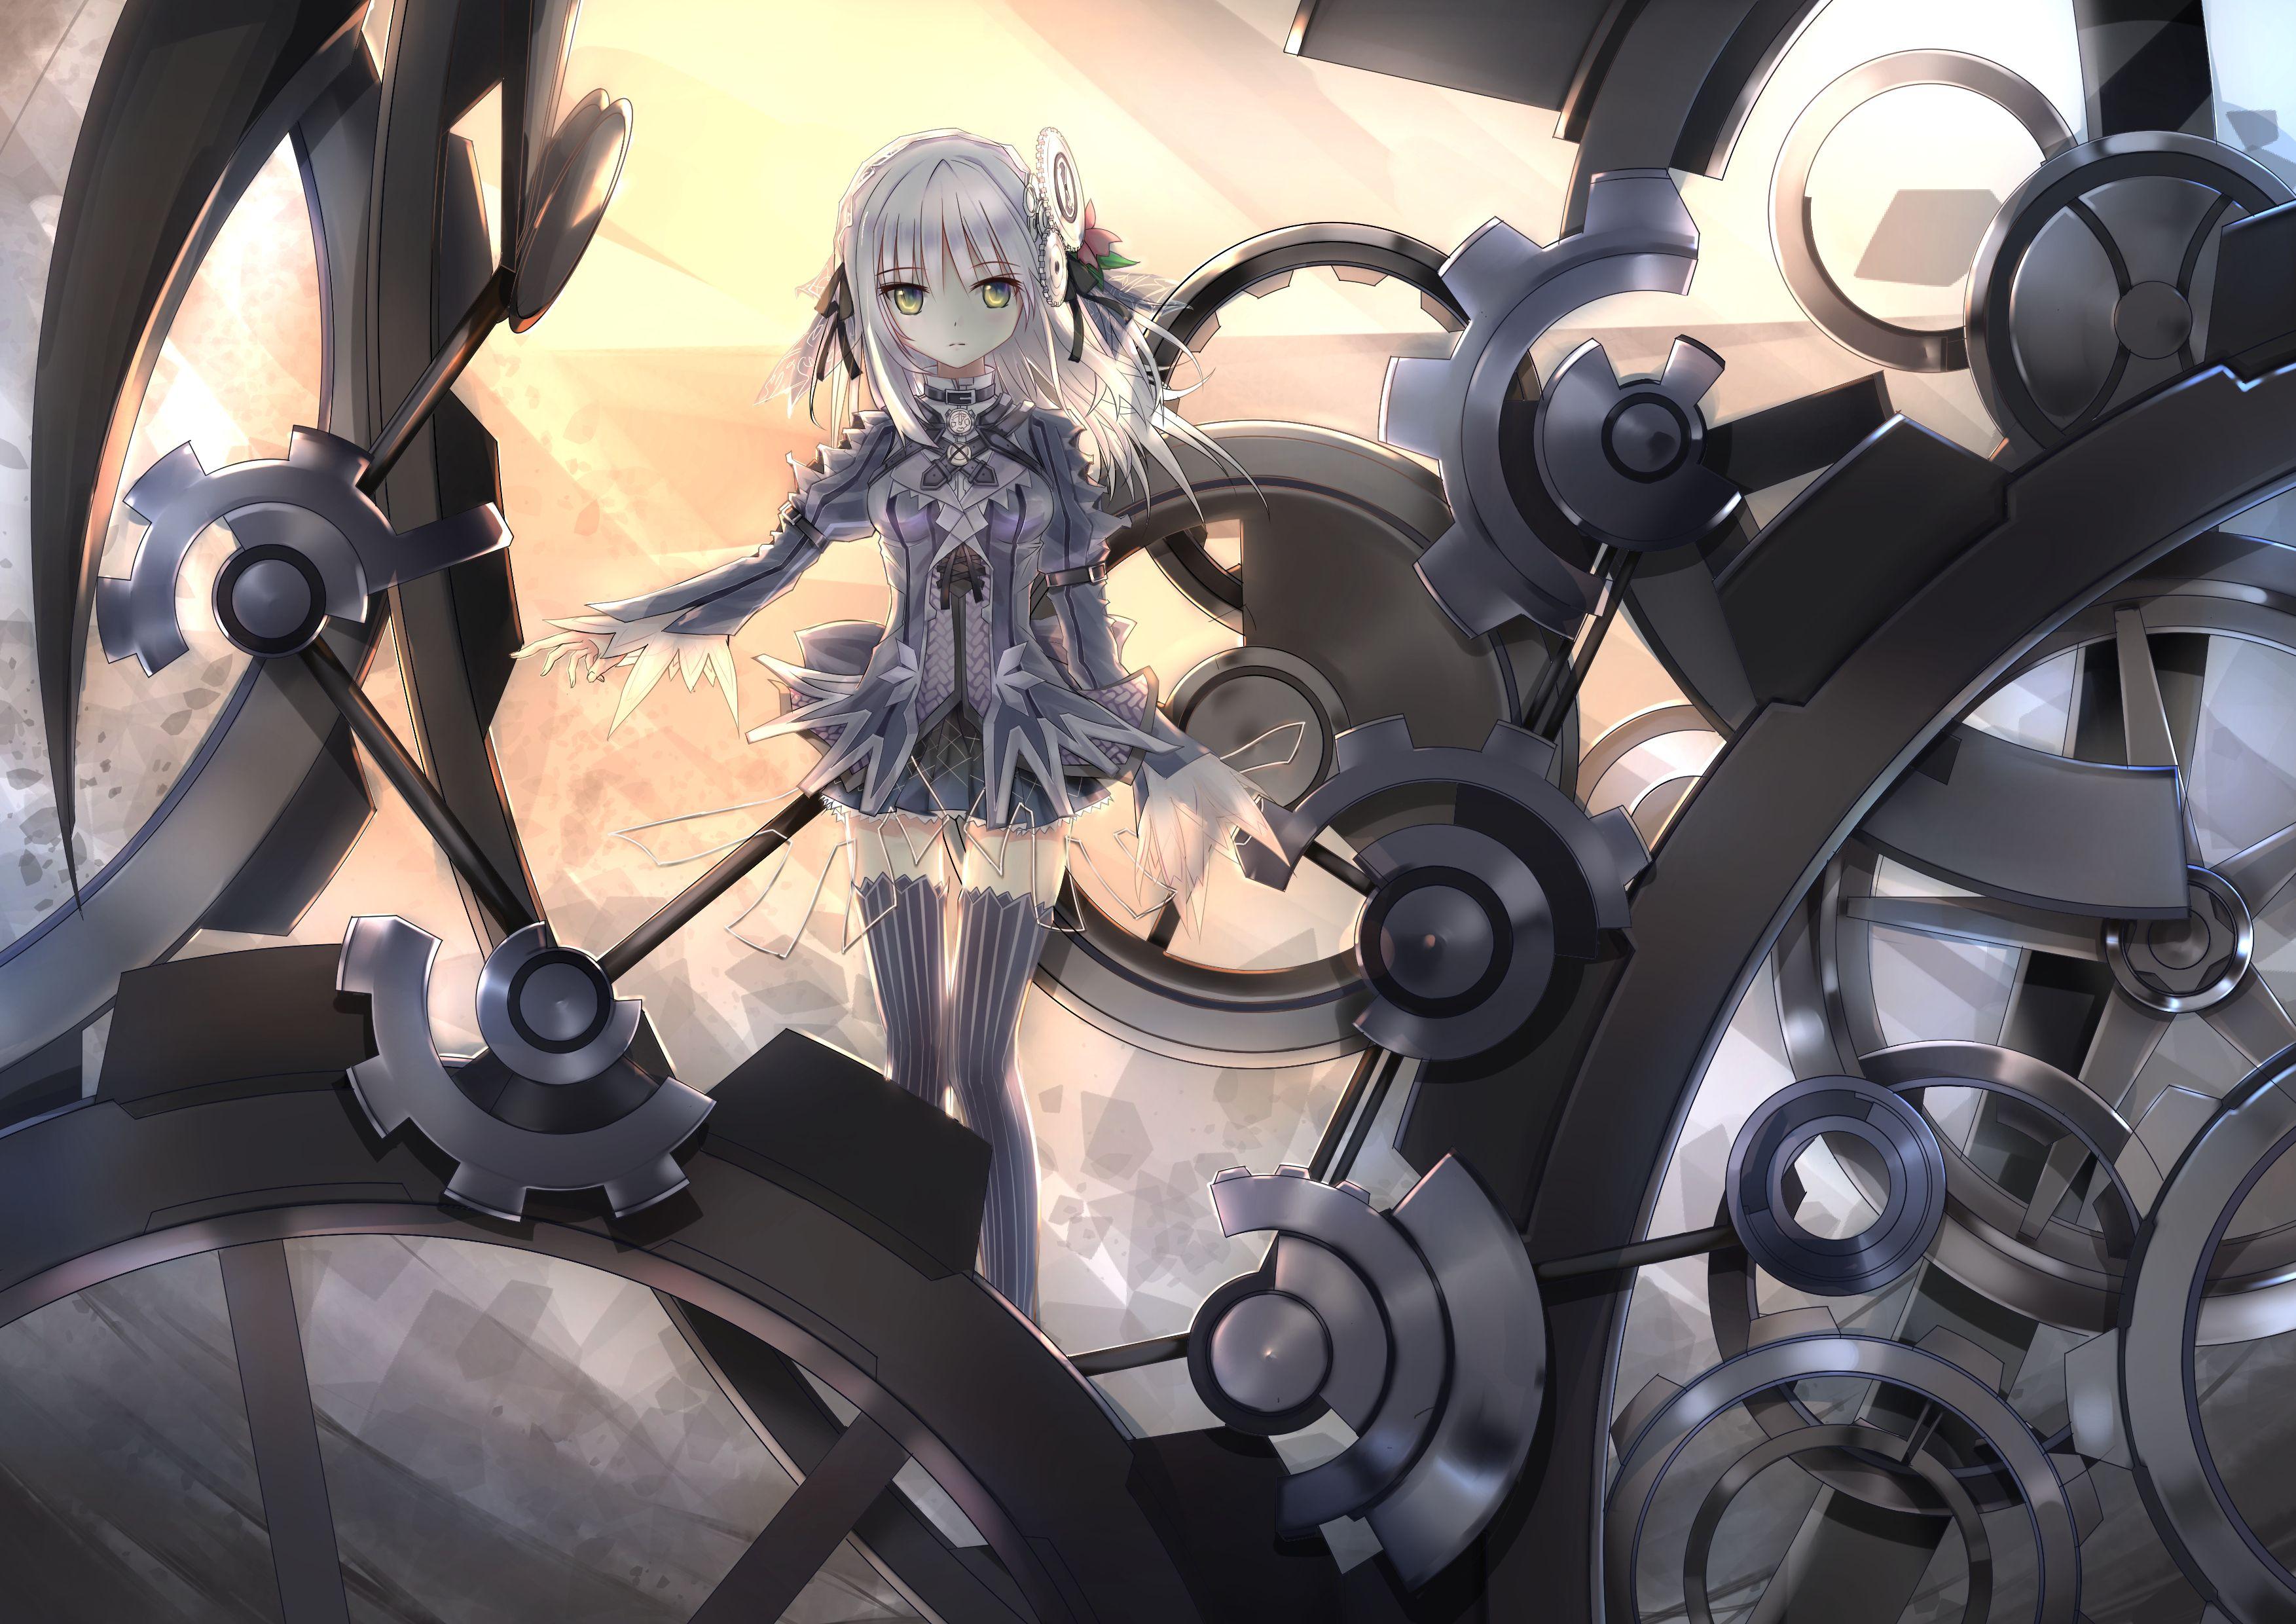 Pin by KURUMI on Clockwork Clockwork, Top 5 anime